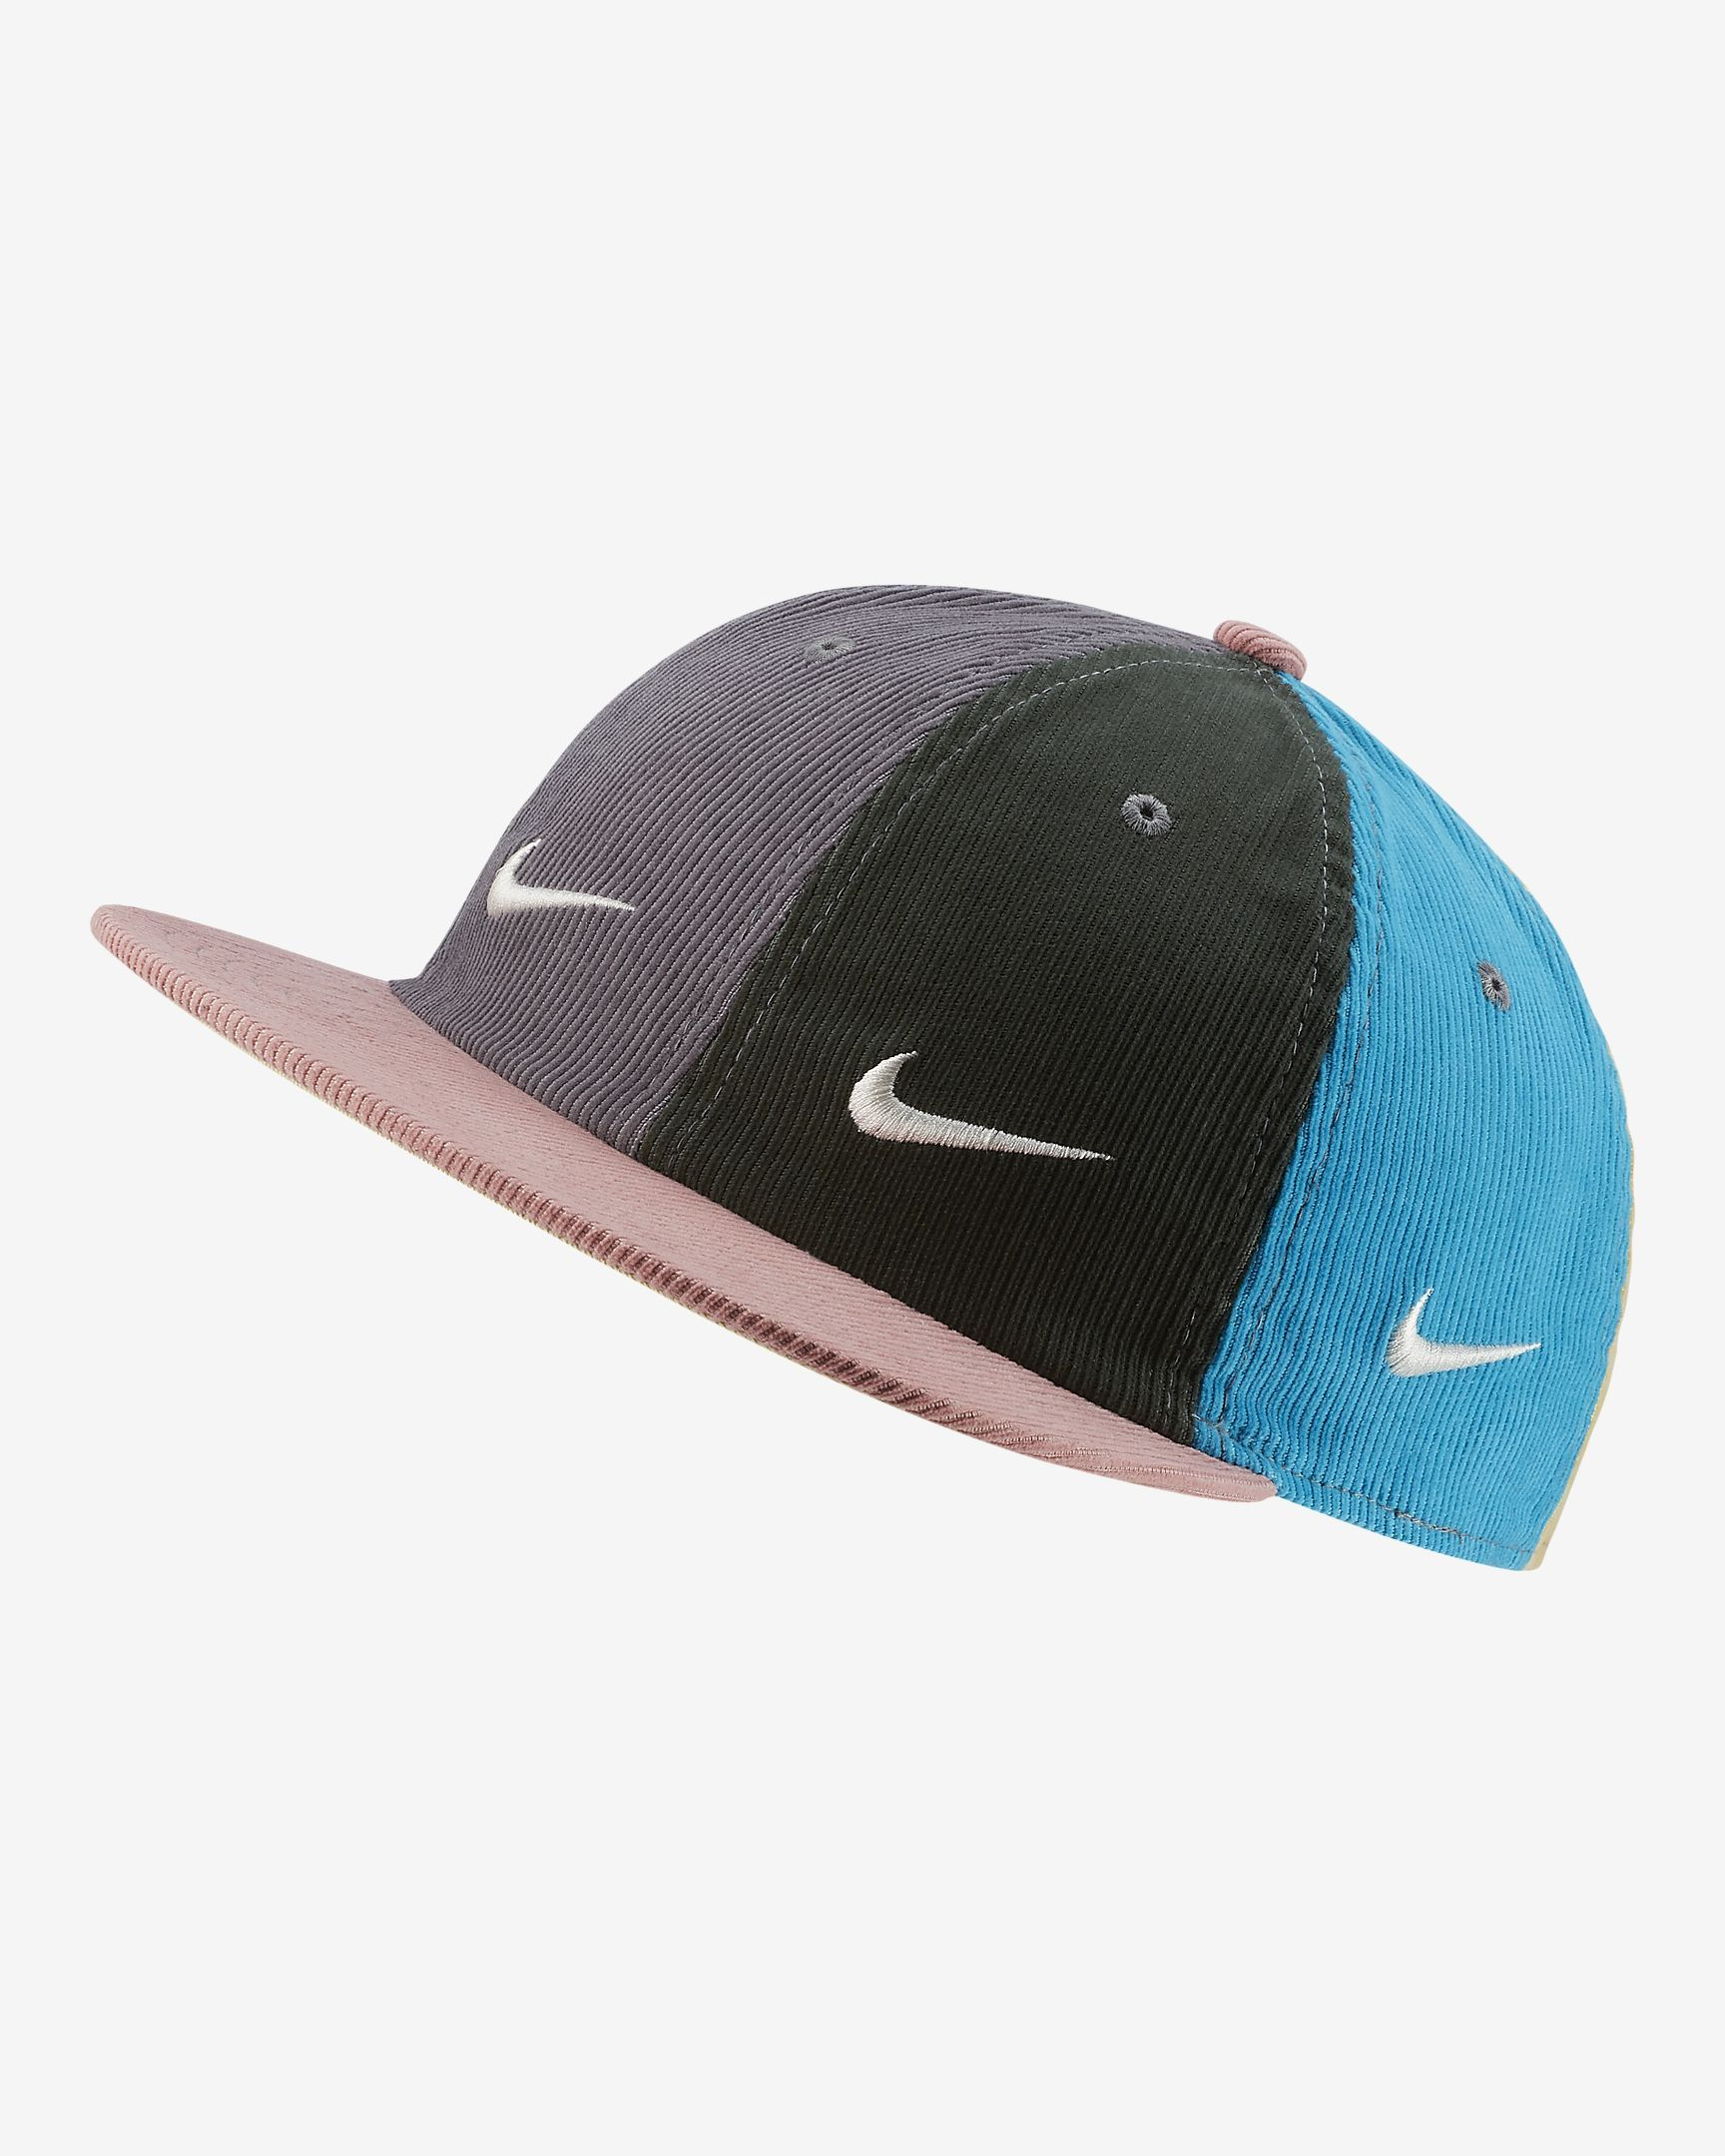 a71866eae3021 Nike Sportswear Heritage 86 QS Adjustable Hat